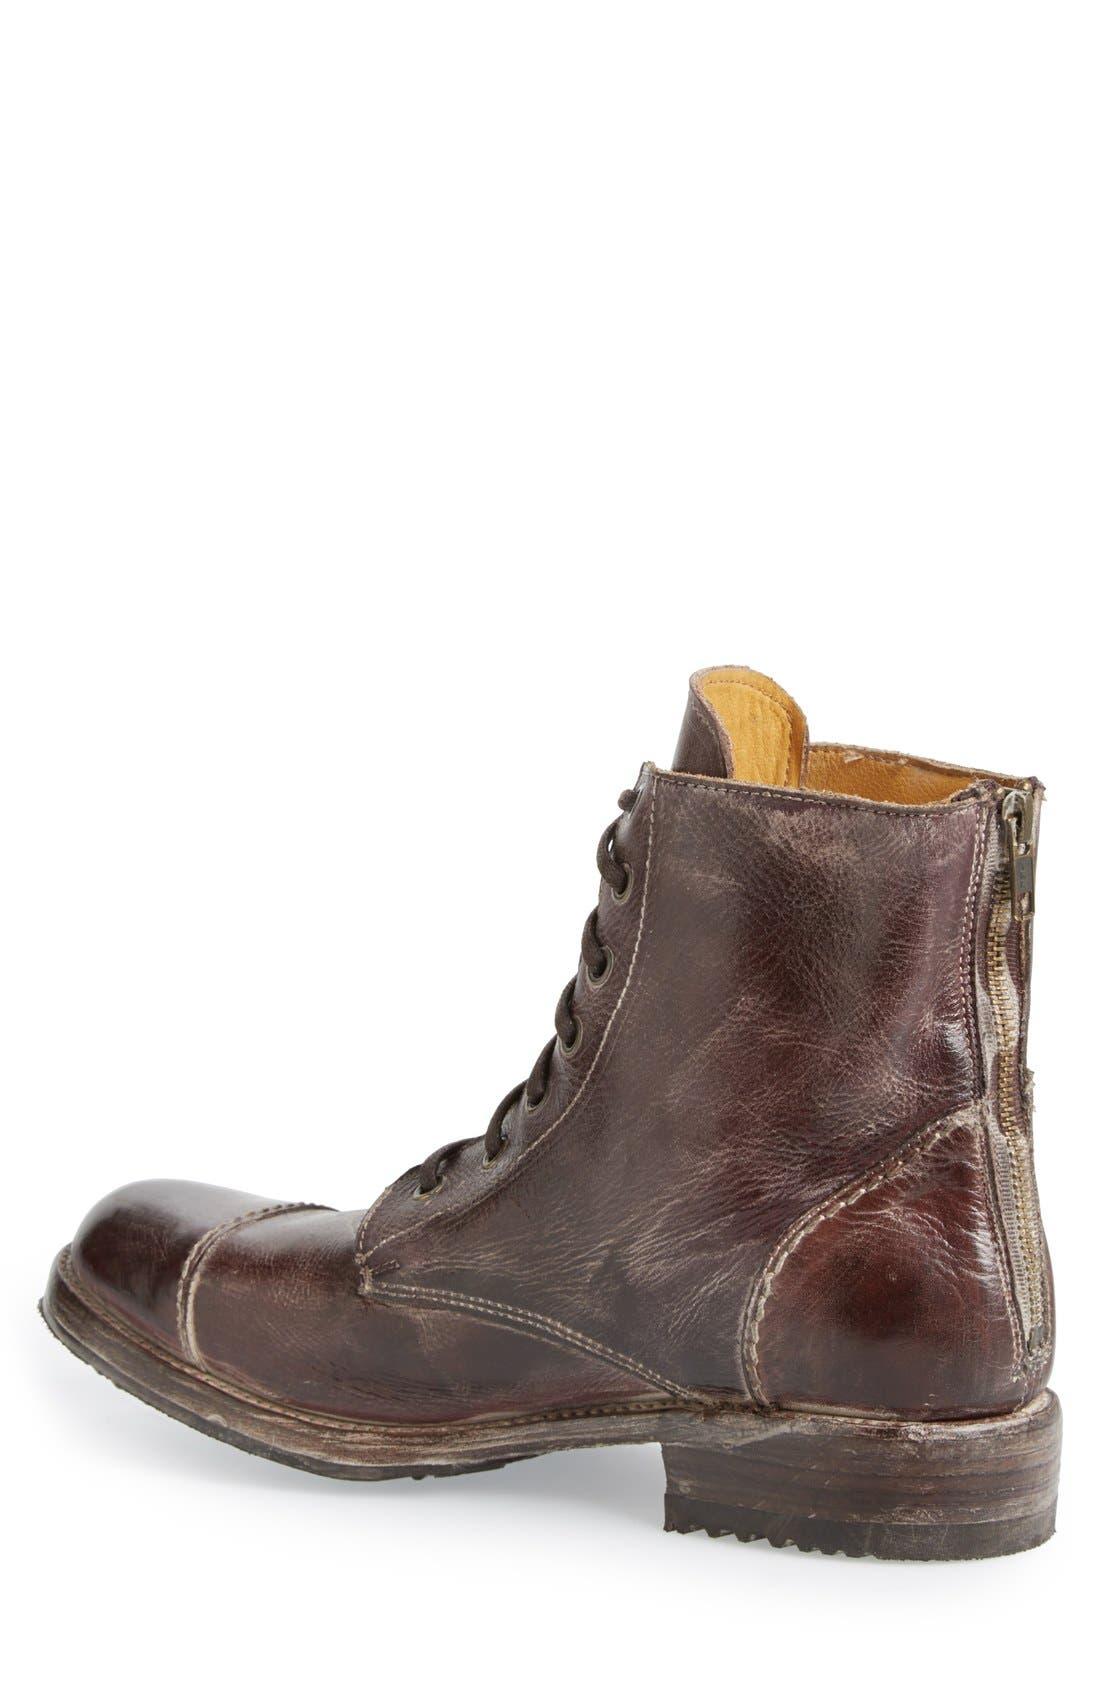 Alternate Image 2  - Bed Stu 'Protégé' Cap Toe Boot (Men)